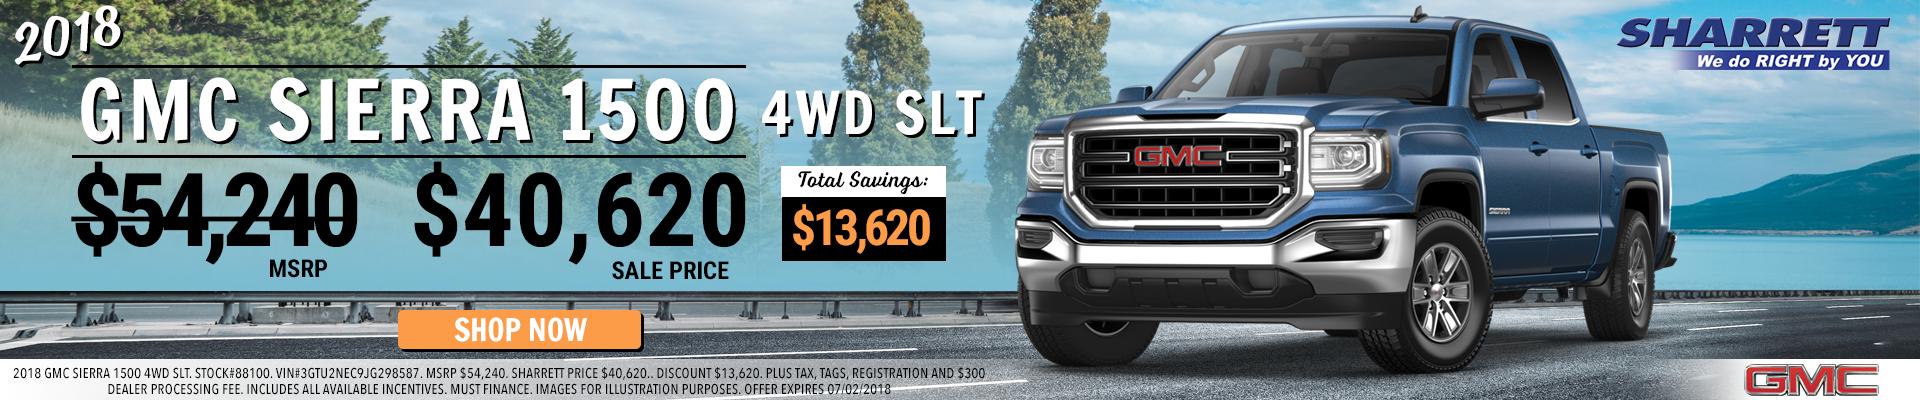 Save $13,620 on a New 2018 GMC Sierra 1500 4WD SLT